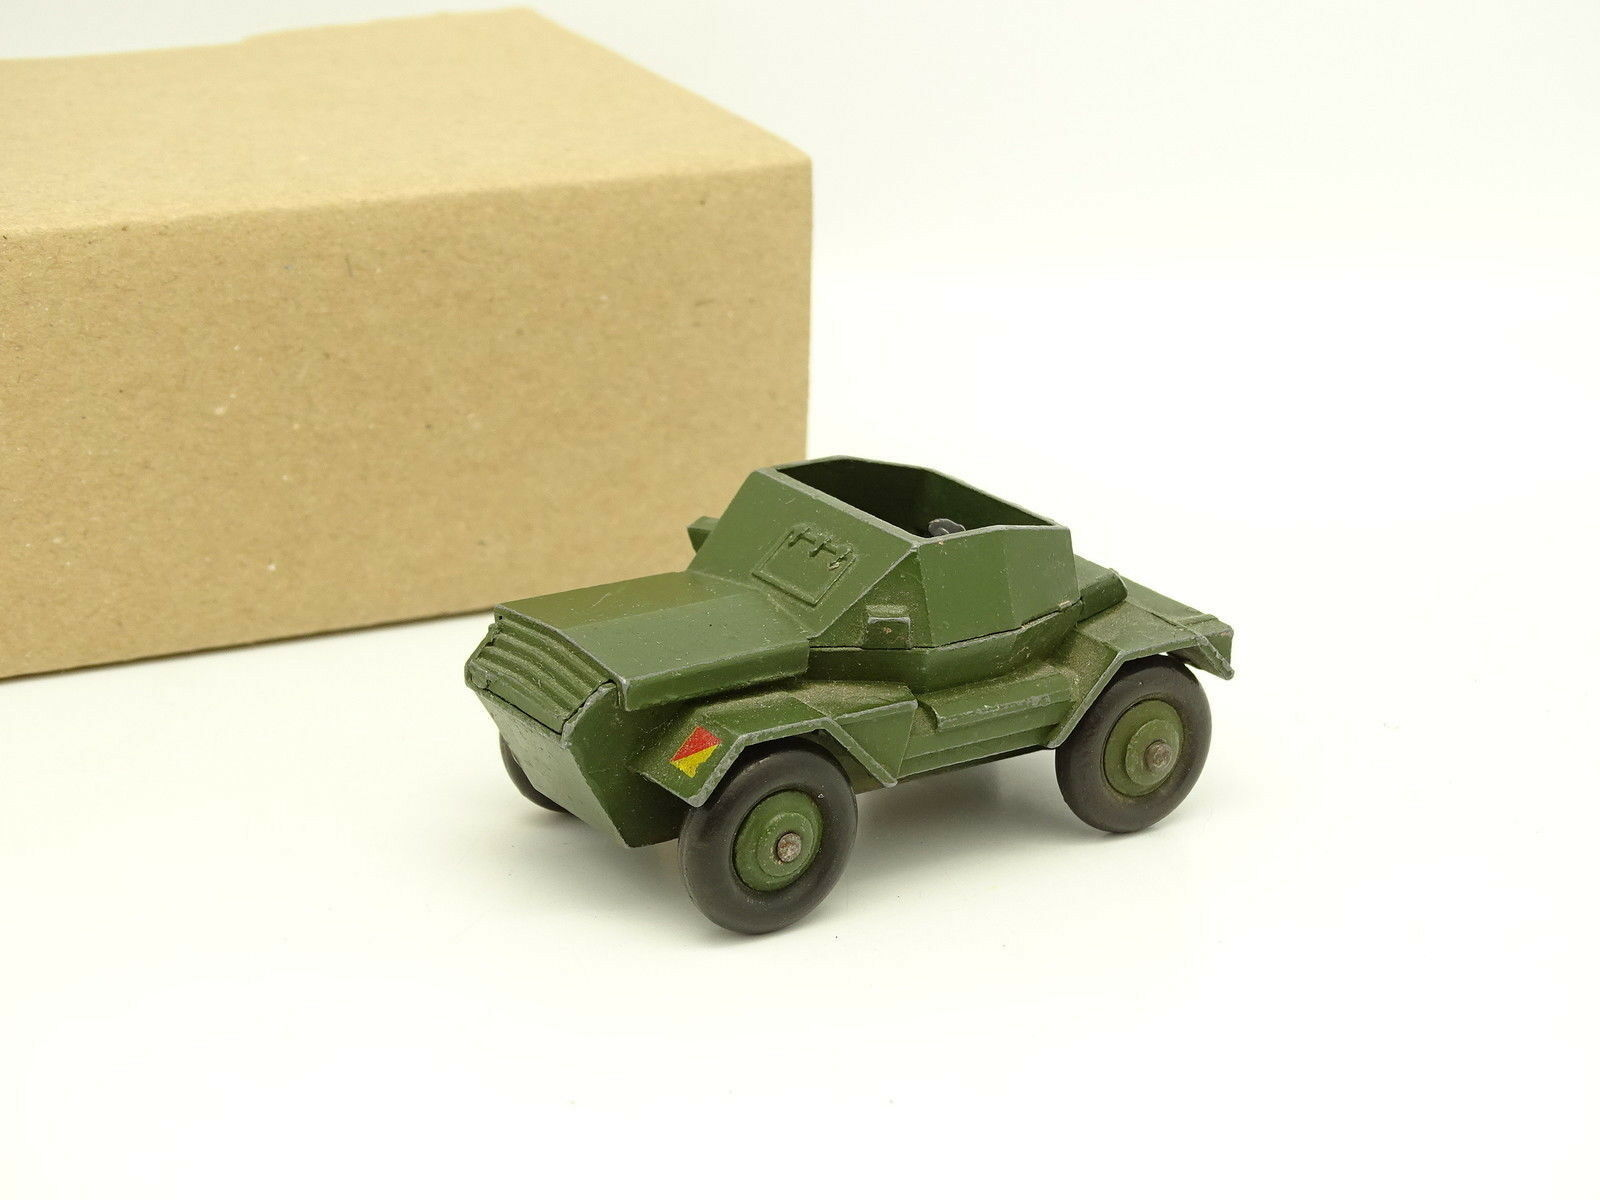 Dinky Toys GB Militar SB 1 43 43 43 - Scout Car 673 9151d9